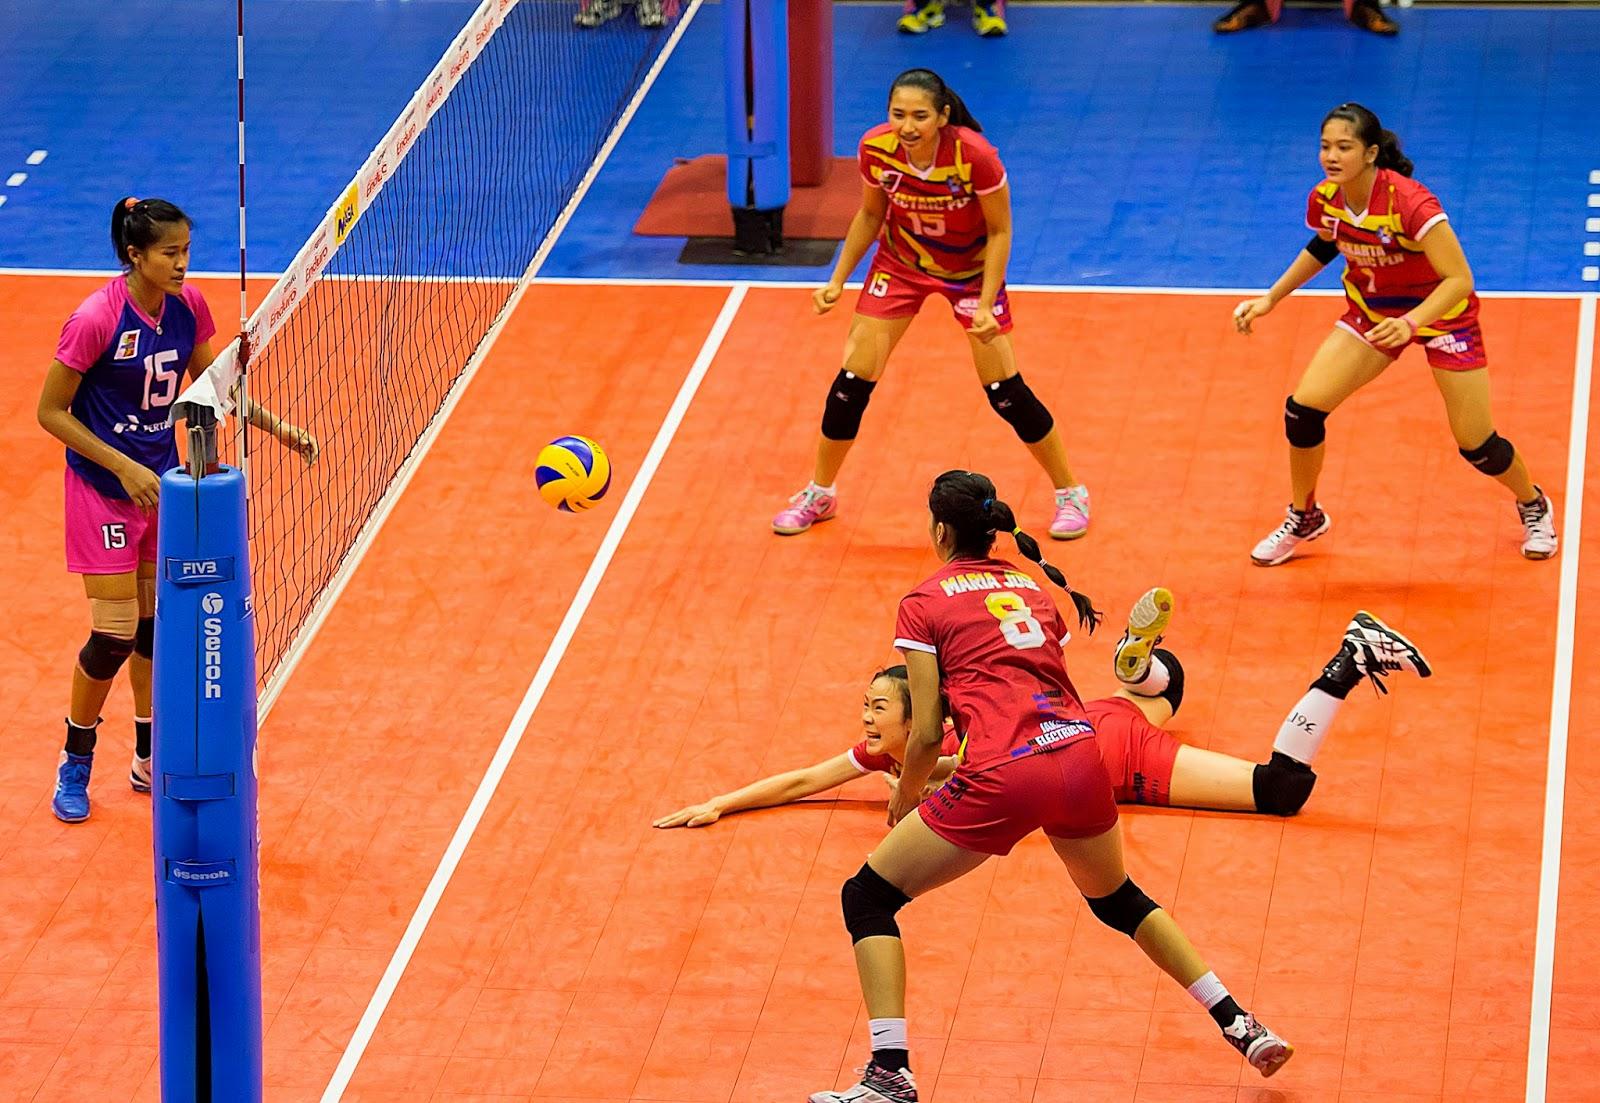 http://tutorialolahraga1.blogspot.com/2015/04/peraturan-resmi-pertandingan-voli.html